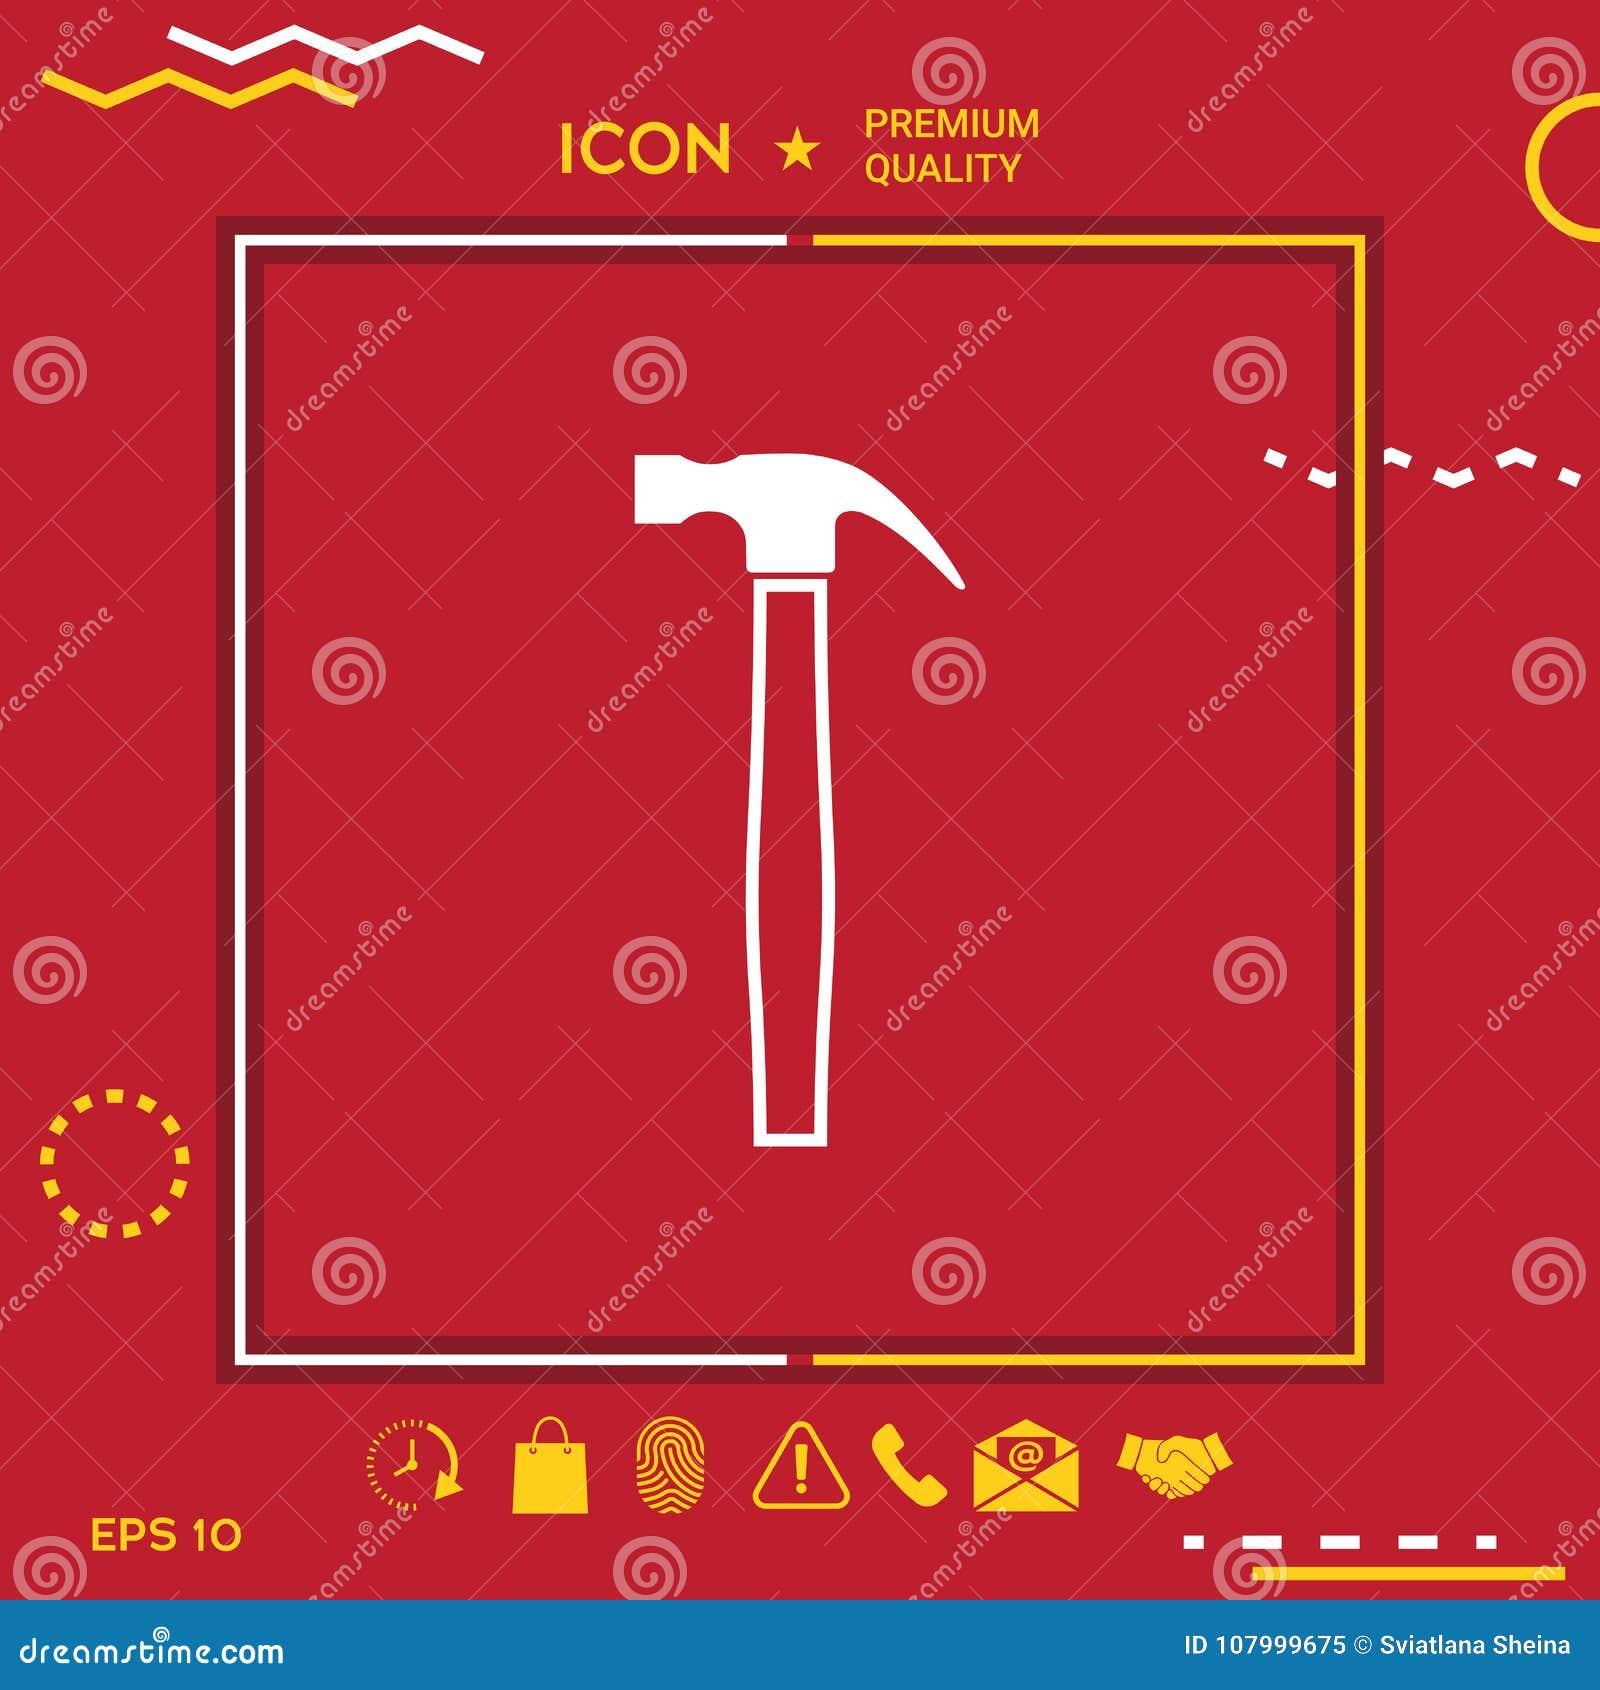 Hammer Symbol Icon Stock Vector Illustration Of Construction